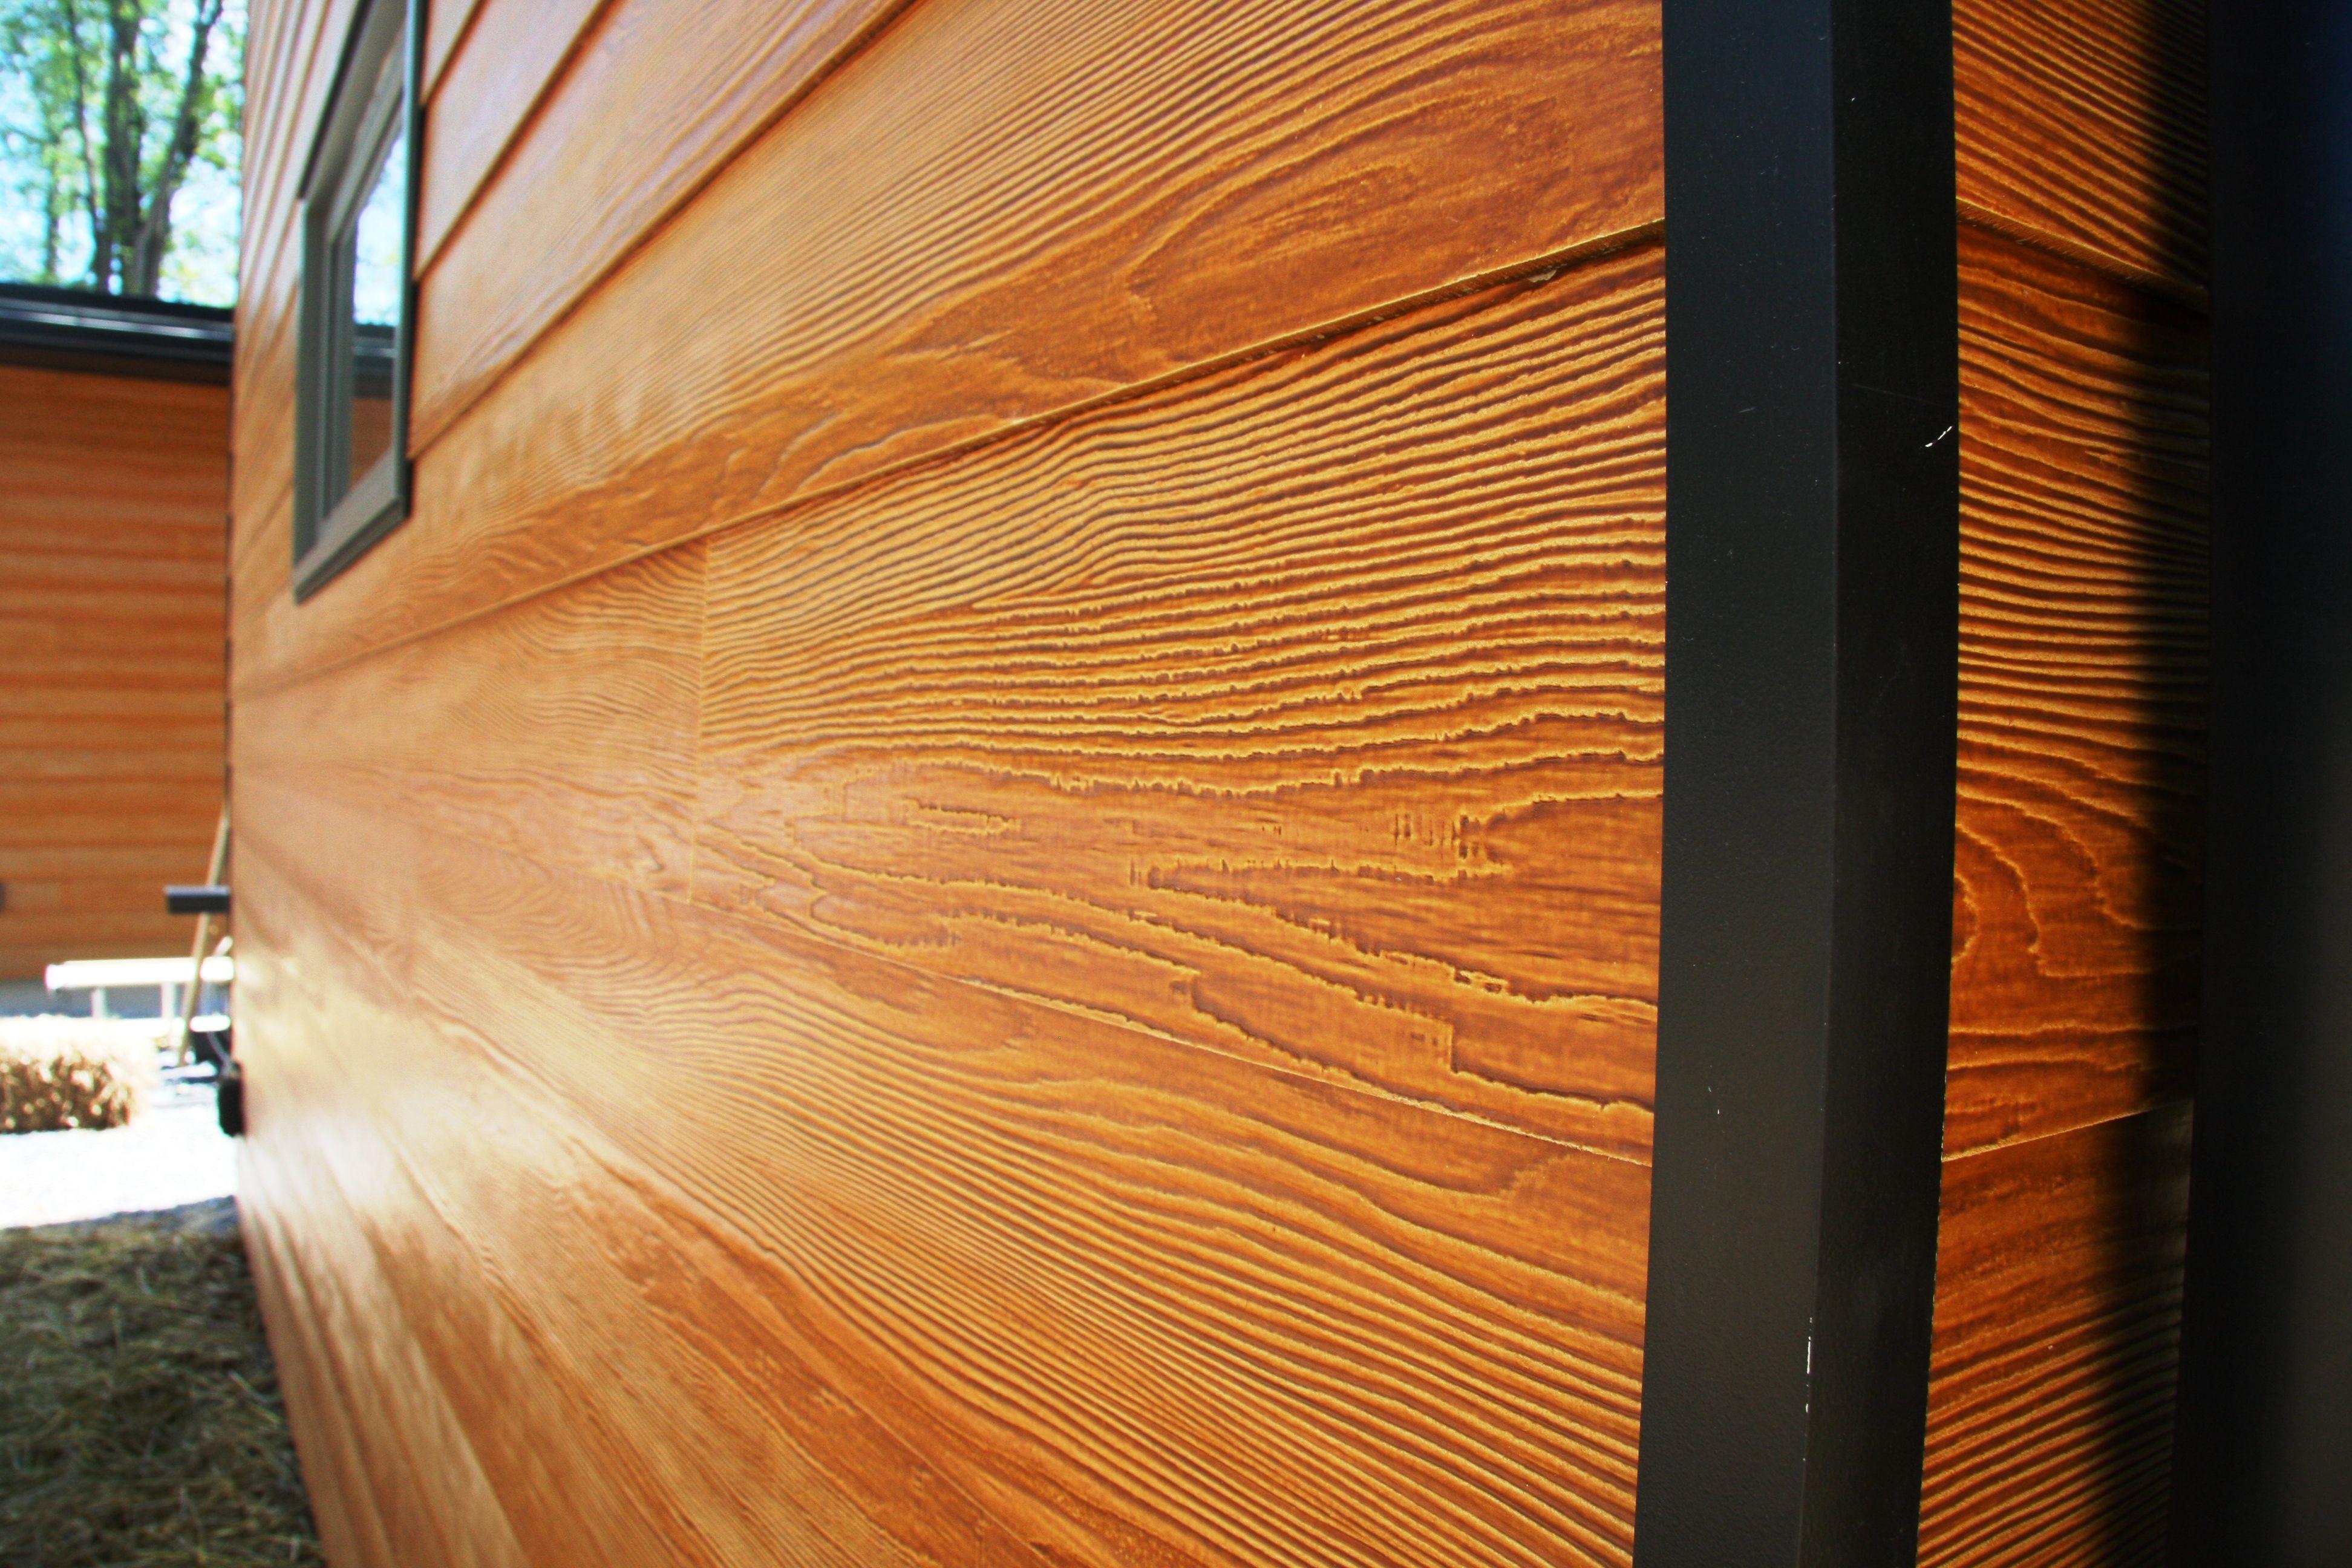 Certainteed Fiber Cement Siding : Certainteed fiber cement siding closeup view cedar or